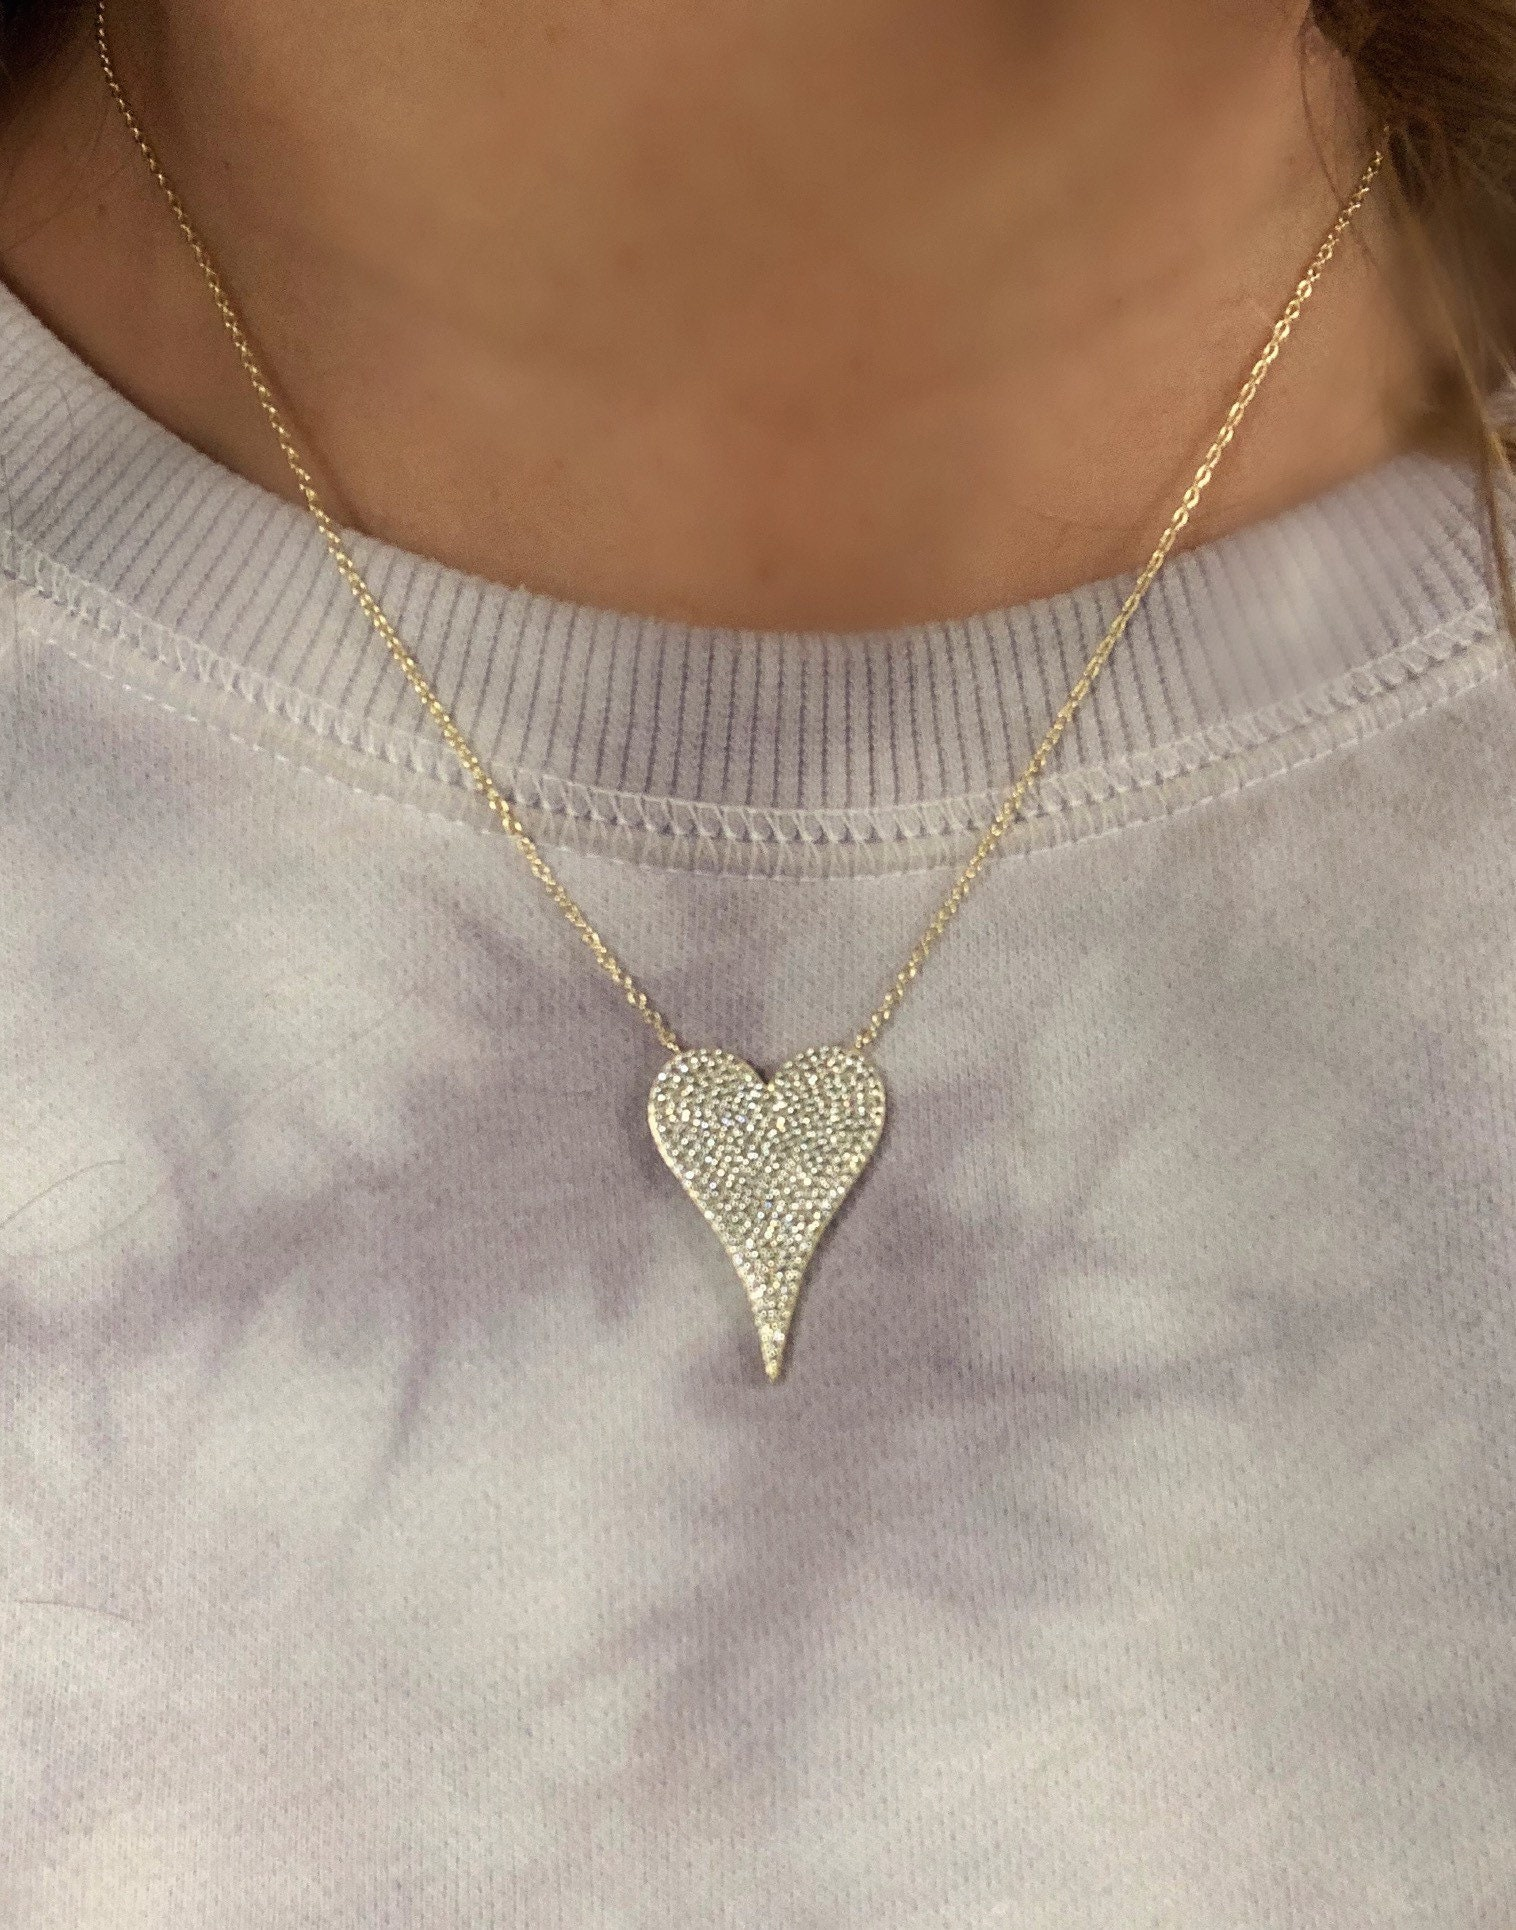 Pave cz heart necklace \u2022 birthday gift \u2022Mother\u2019s Day\u2022 elongated diamond heart\u2022 cz heart \u2022 love necklace \u2022 16-18 in